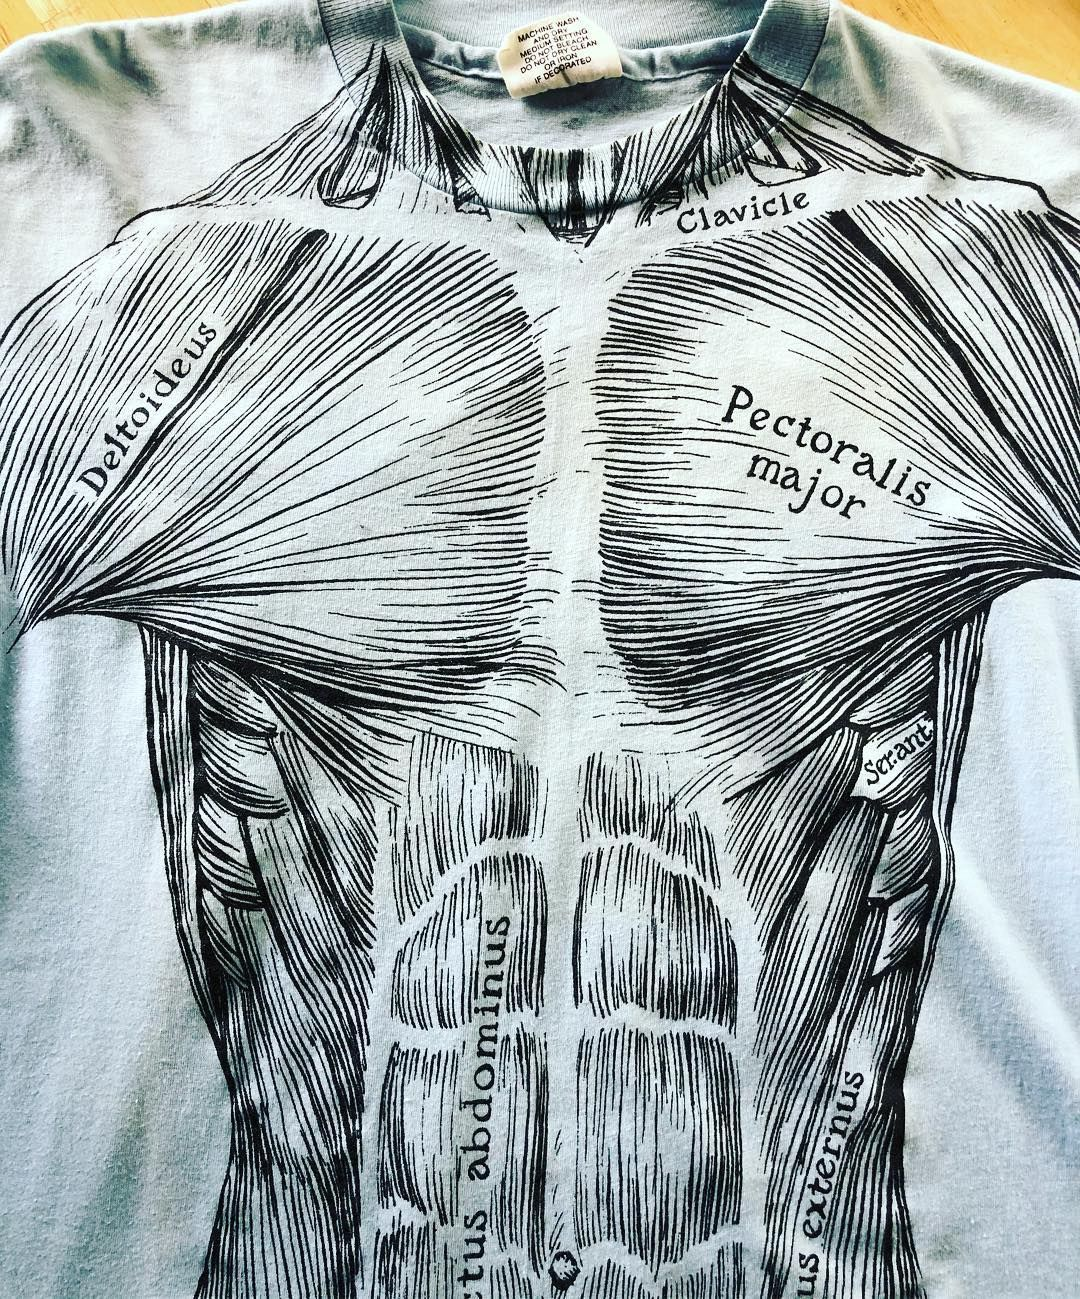 True Vintage Muscle T Shirt Leslie Arwin Bova 70s Size L Anatomy